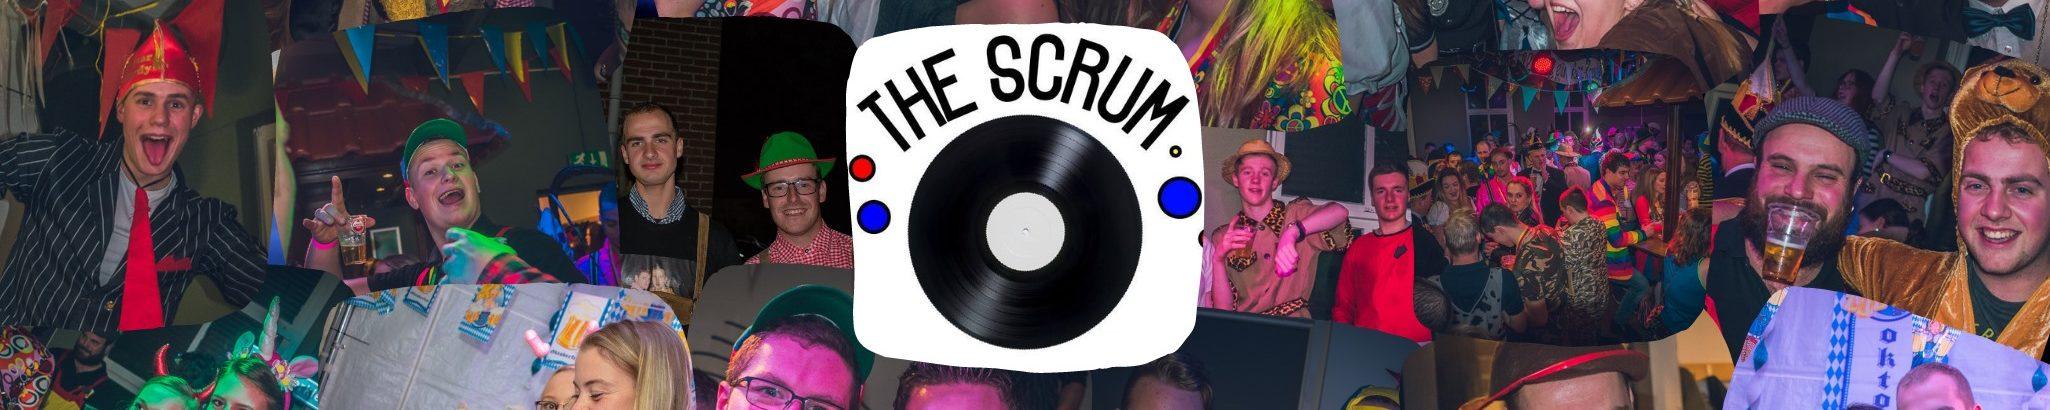 Jeugdsoos The Scrum